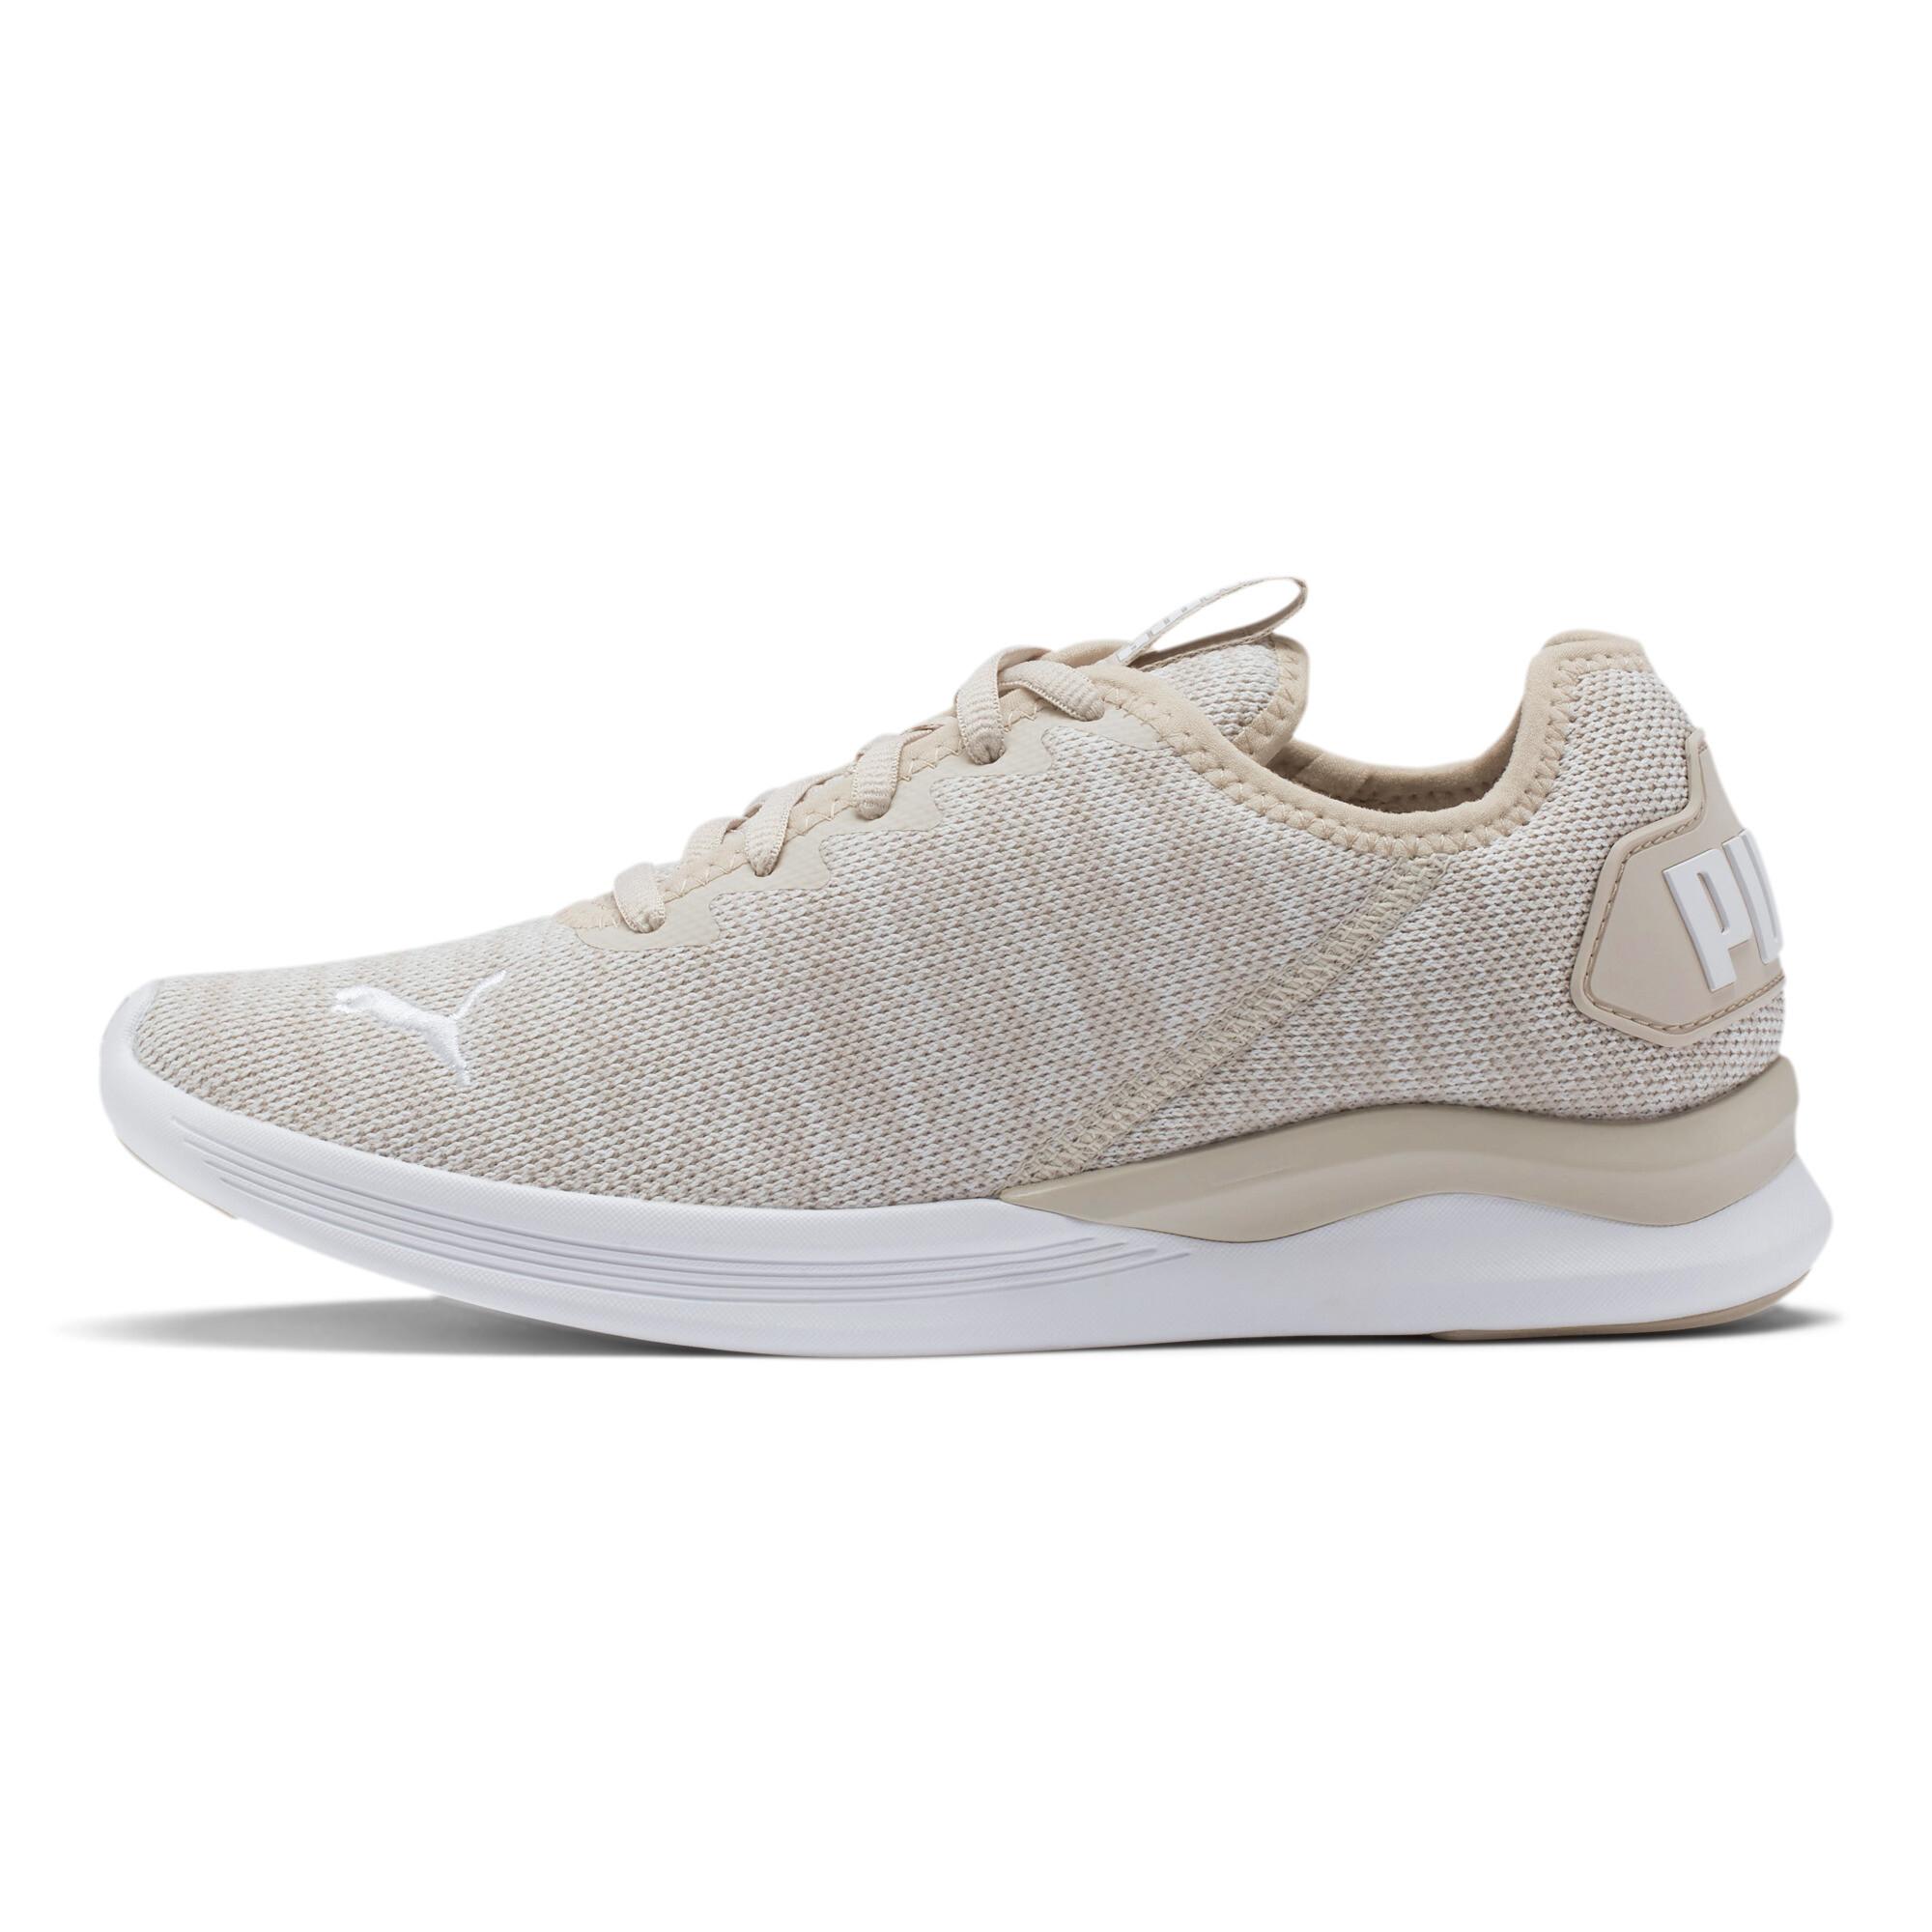 PUMA-Ballast-Women-039-s-Running-Shoes-Women-Shoe-Running thumbnail 24